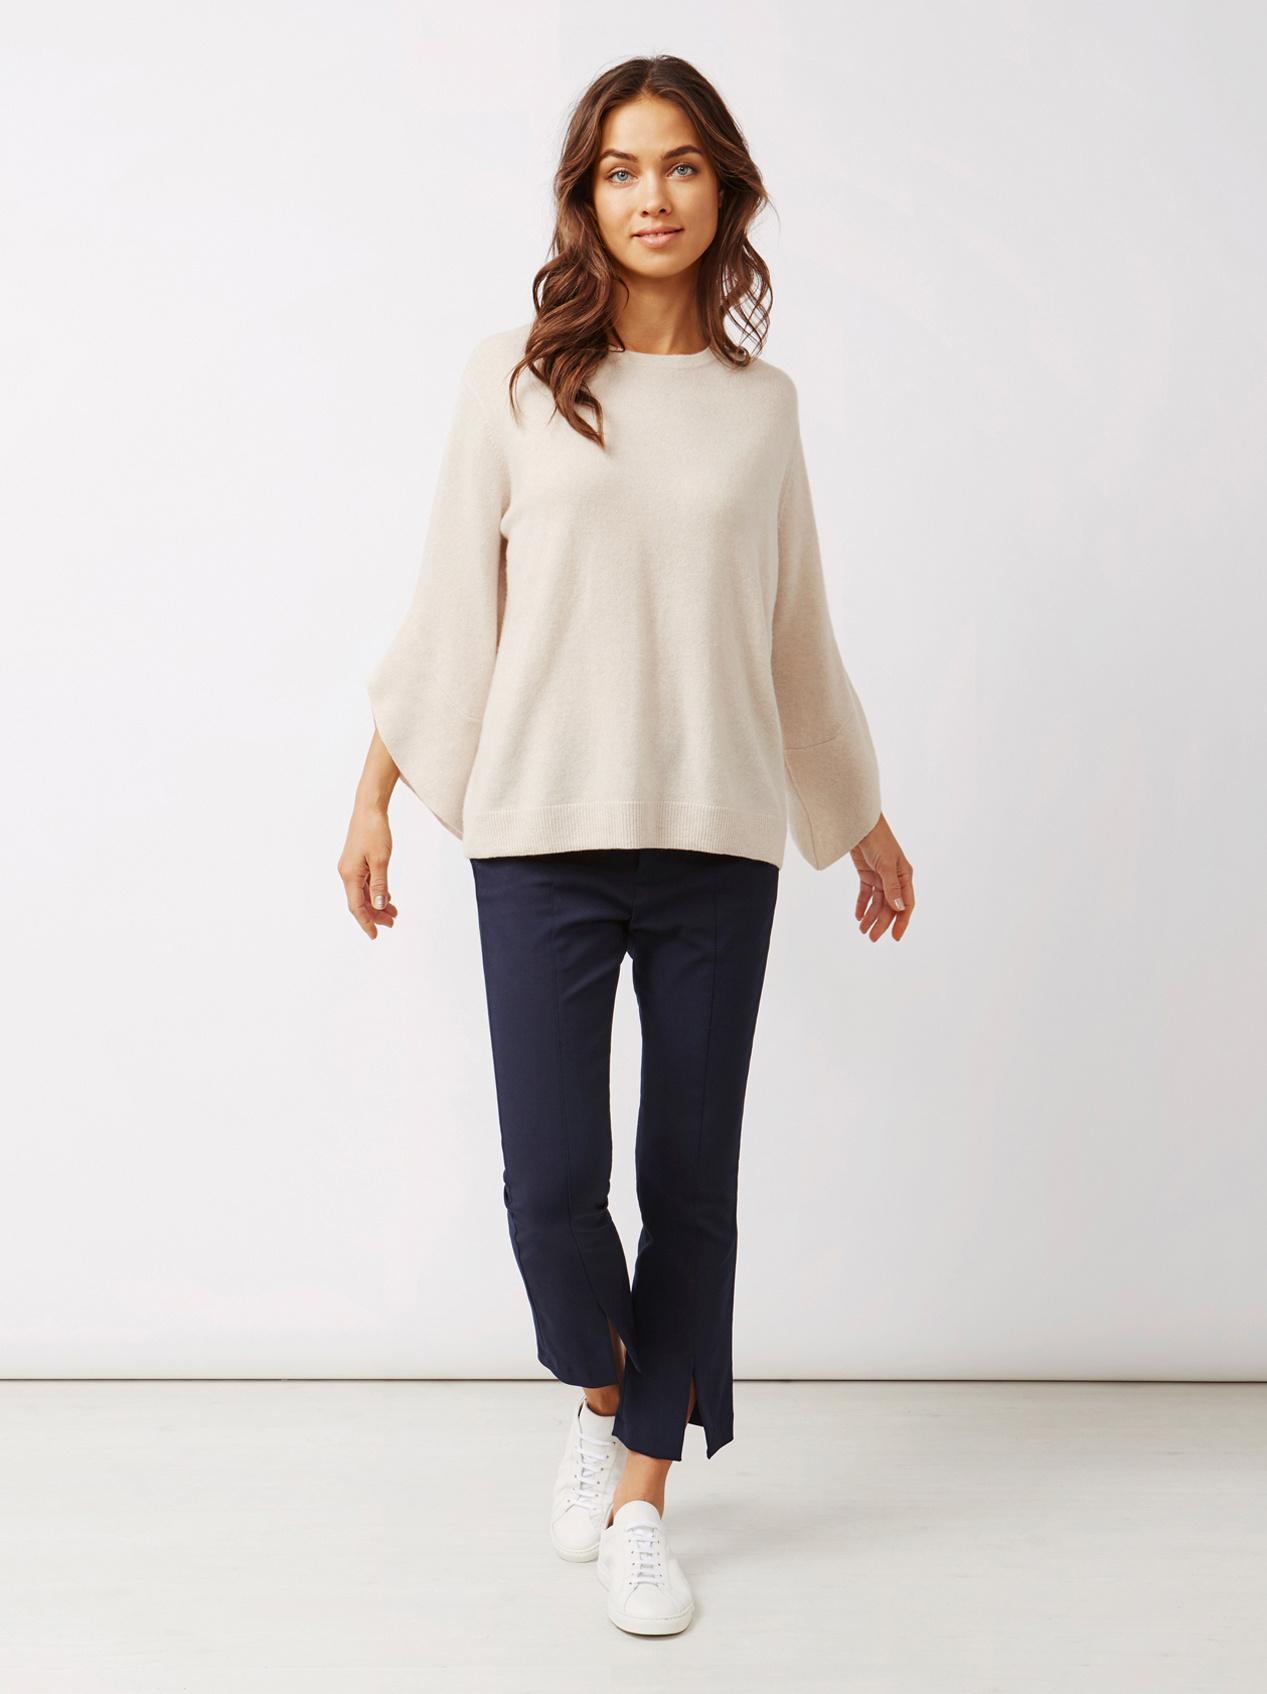 Soft Goat Women's Tulip Arm Sweater Beige